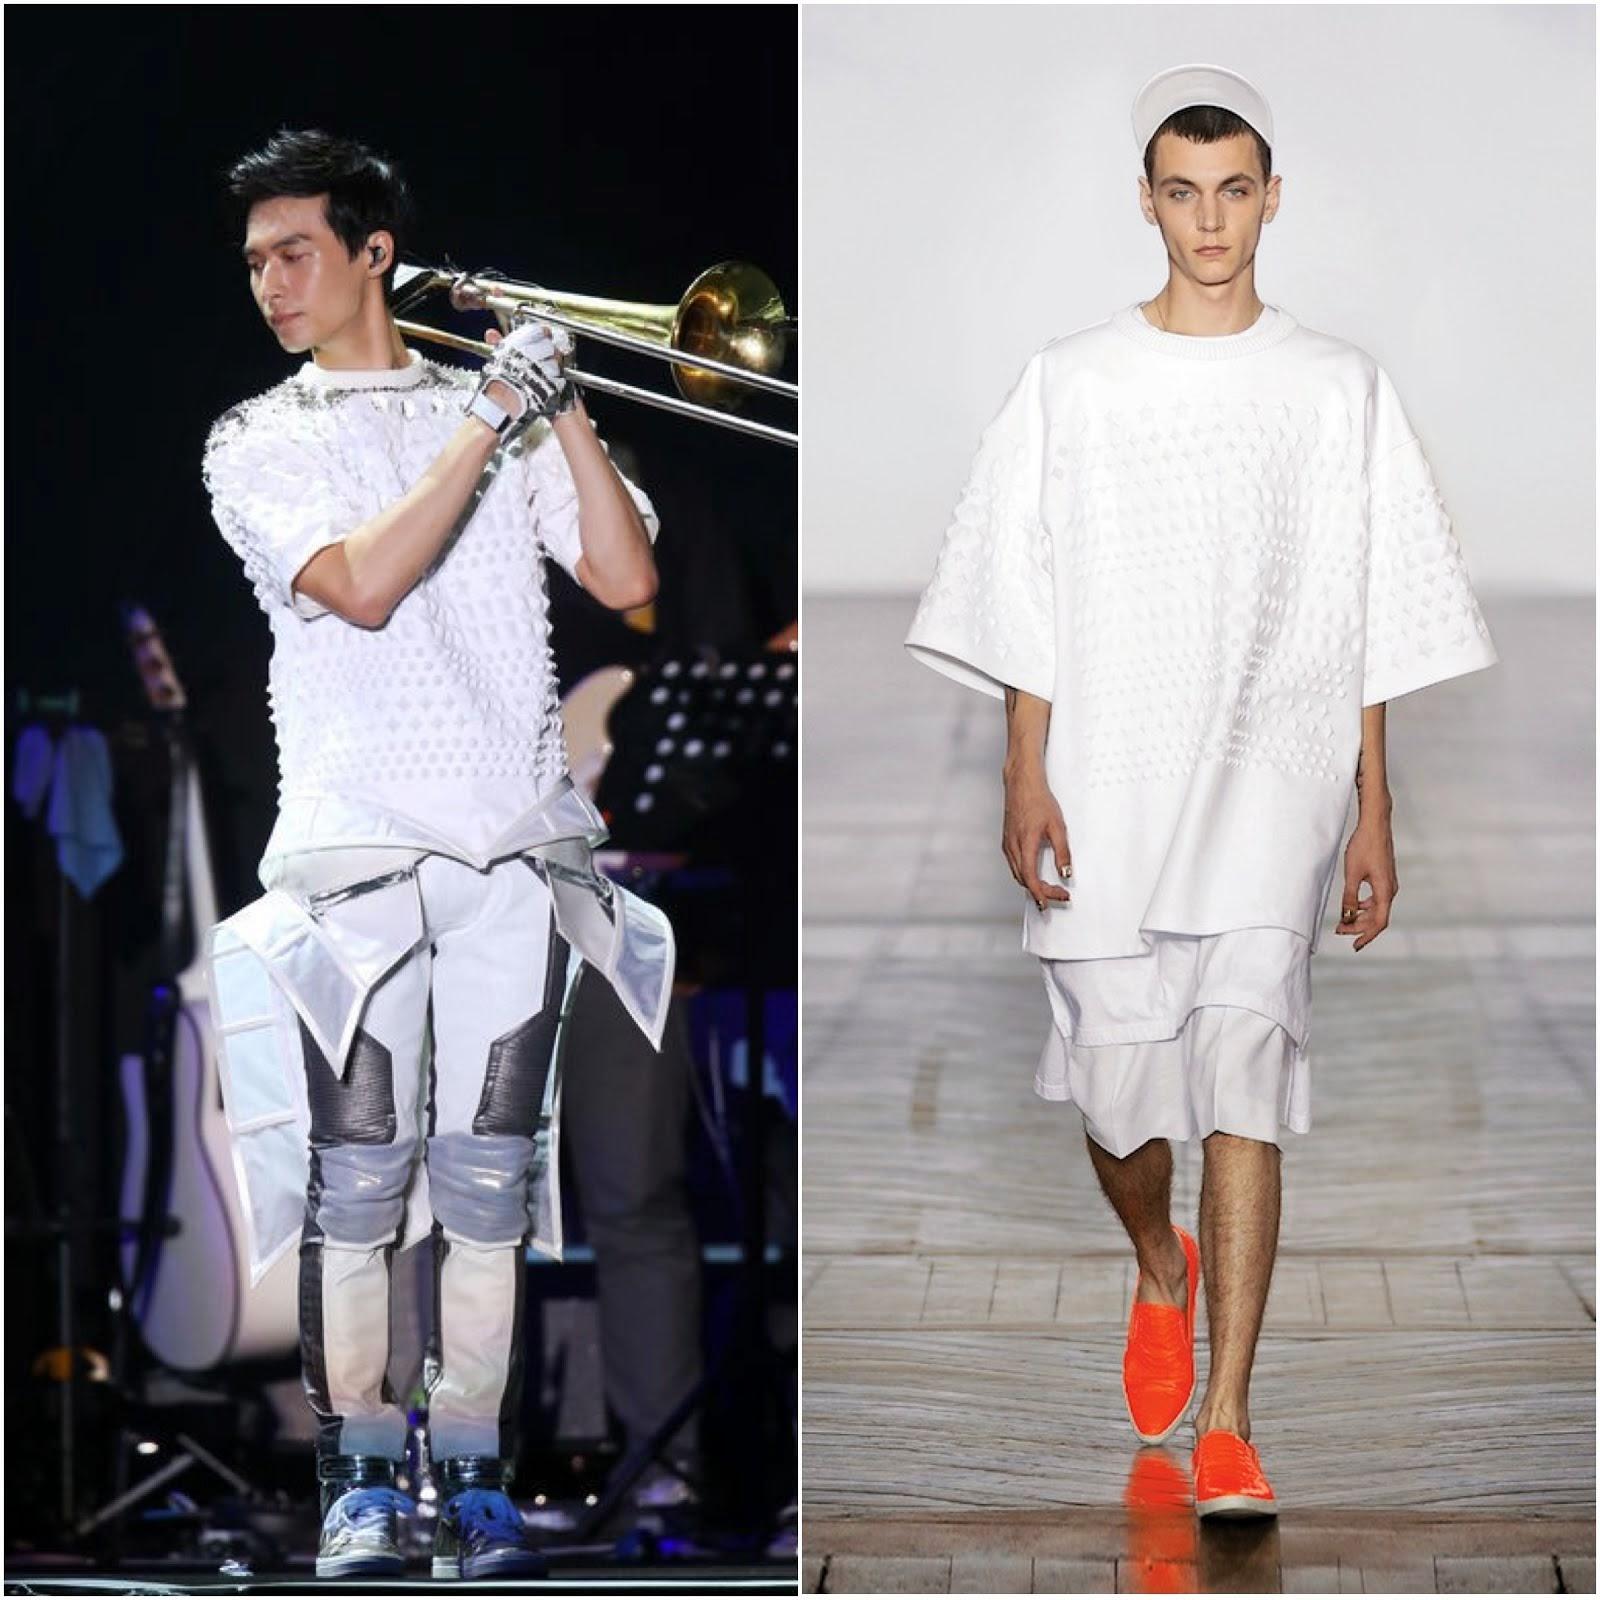 00O00 Menswear Blog: Yen-J [严爵] in Juun.J, Balmain and Givenchy - Taiwan concert July 2013 严爵首次站上小巨蛋开唱